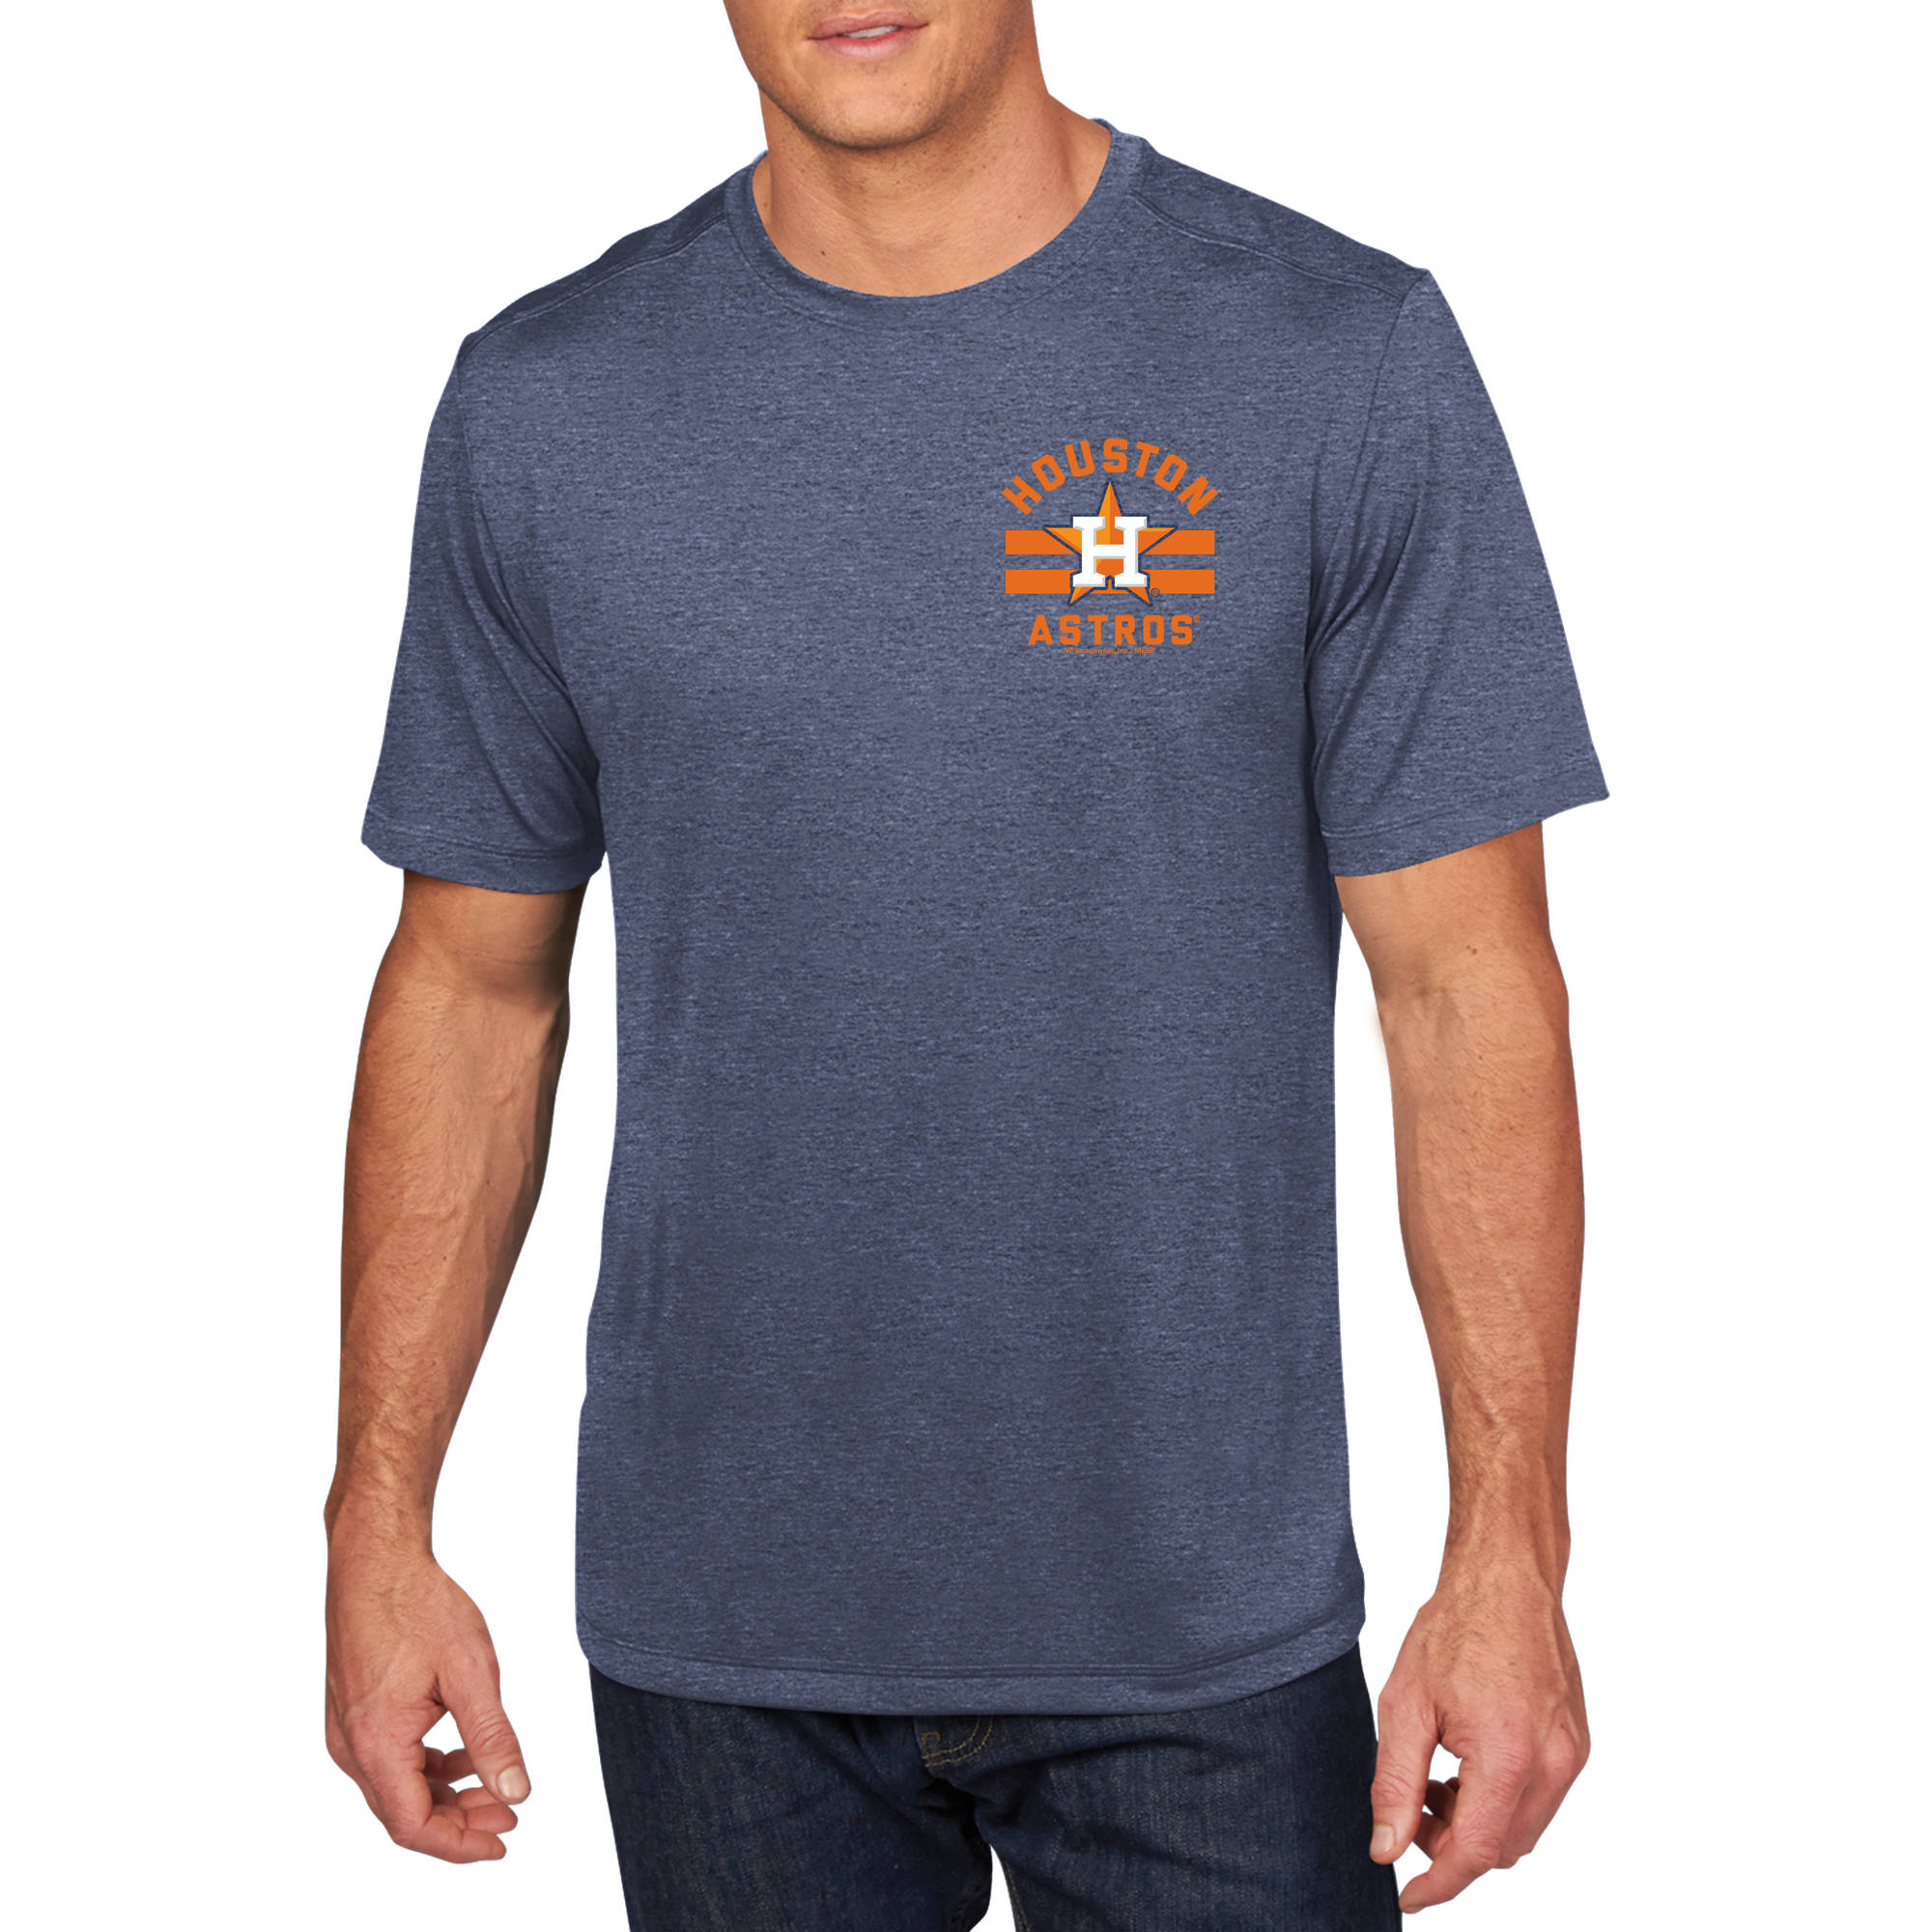 MLB - Mens Houston Astros Short Sleeve Synthetic Team Tee